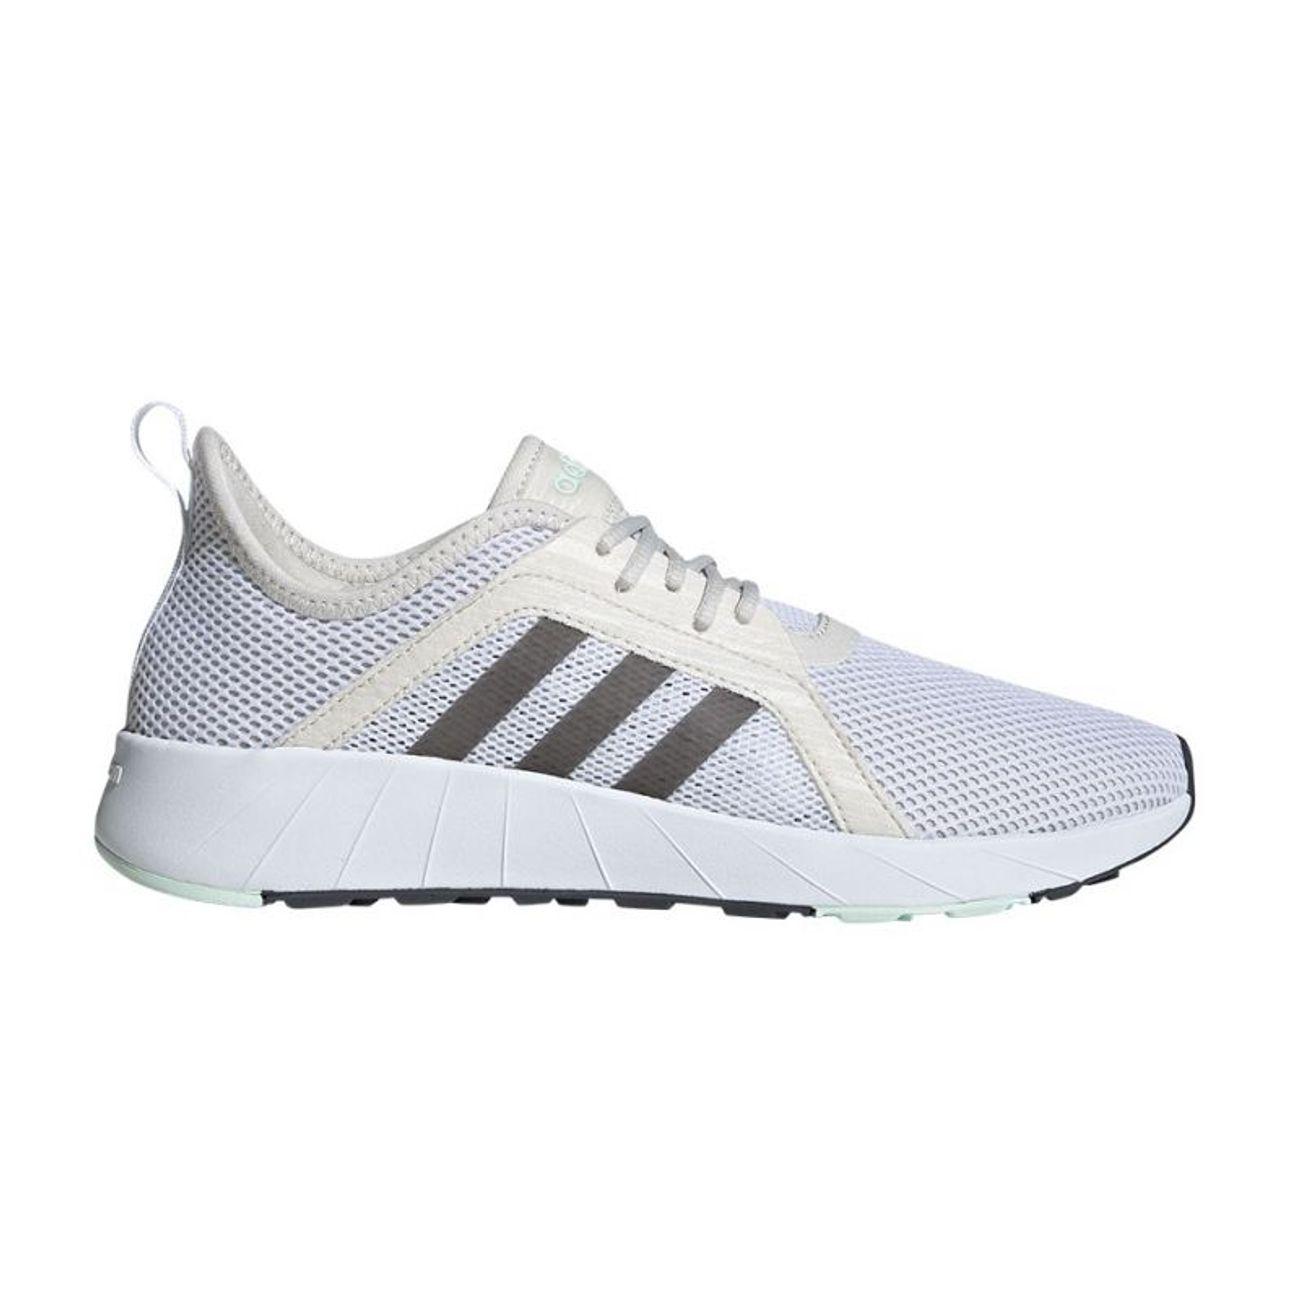 Padel Adidas Run Negro Khoe F97195 Adulte Mujer Blanco CxroWedB